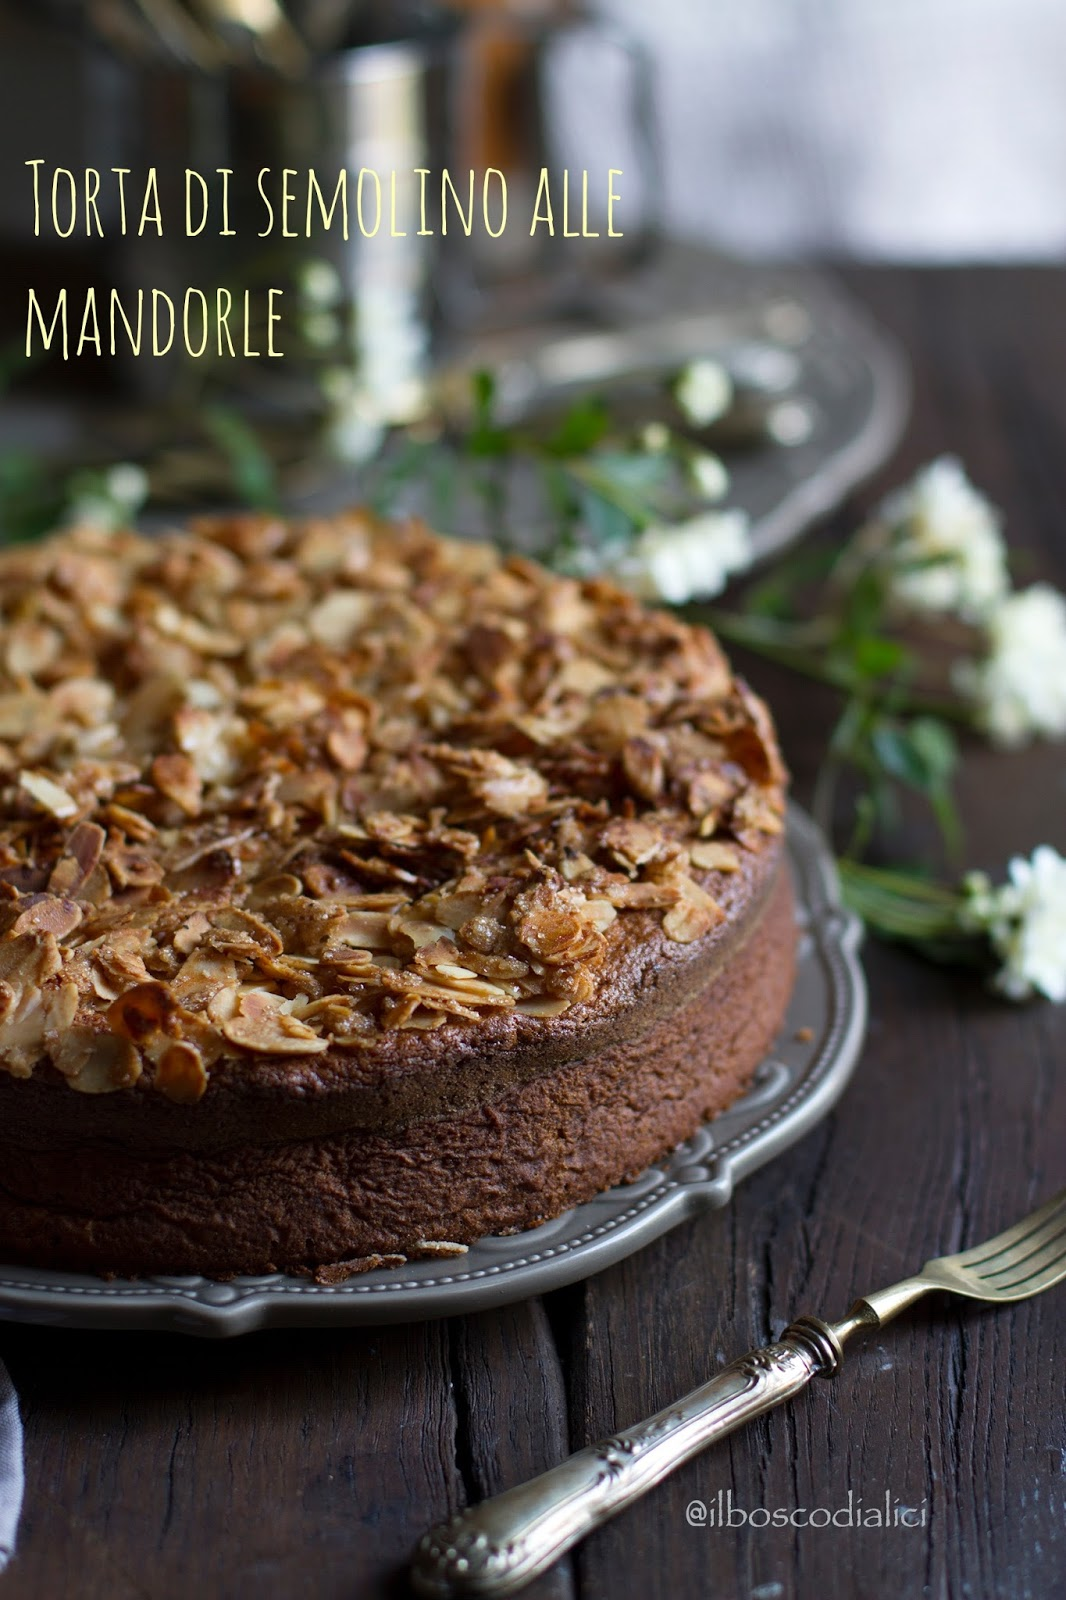 torta di semolino alle mandorle